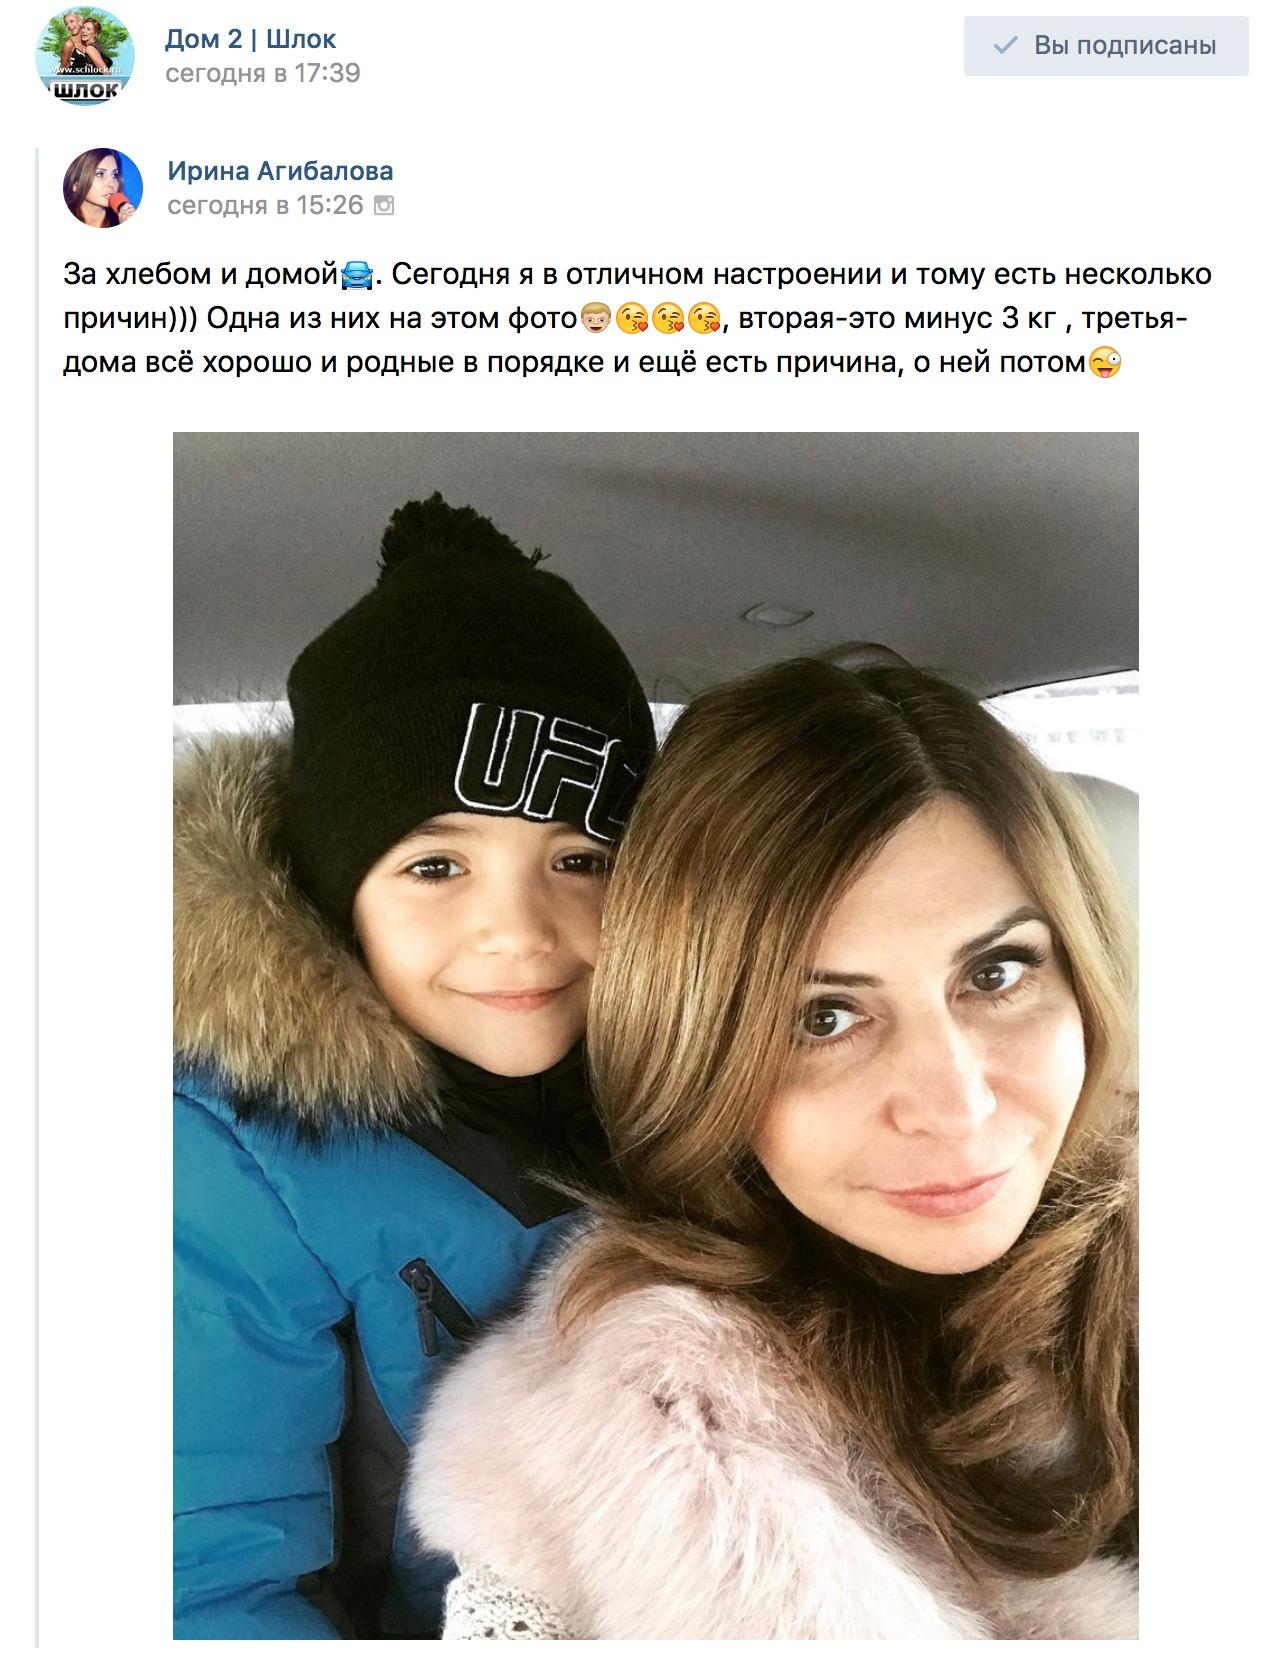 Агибалова теряет кг